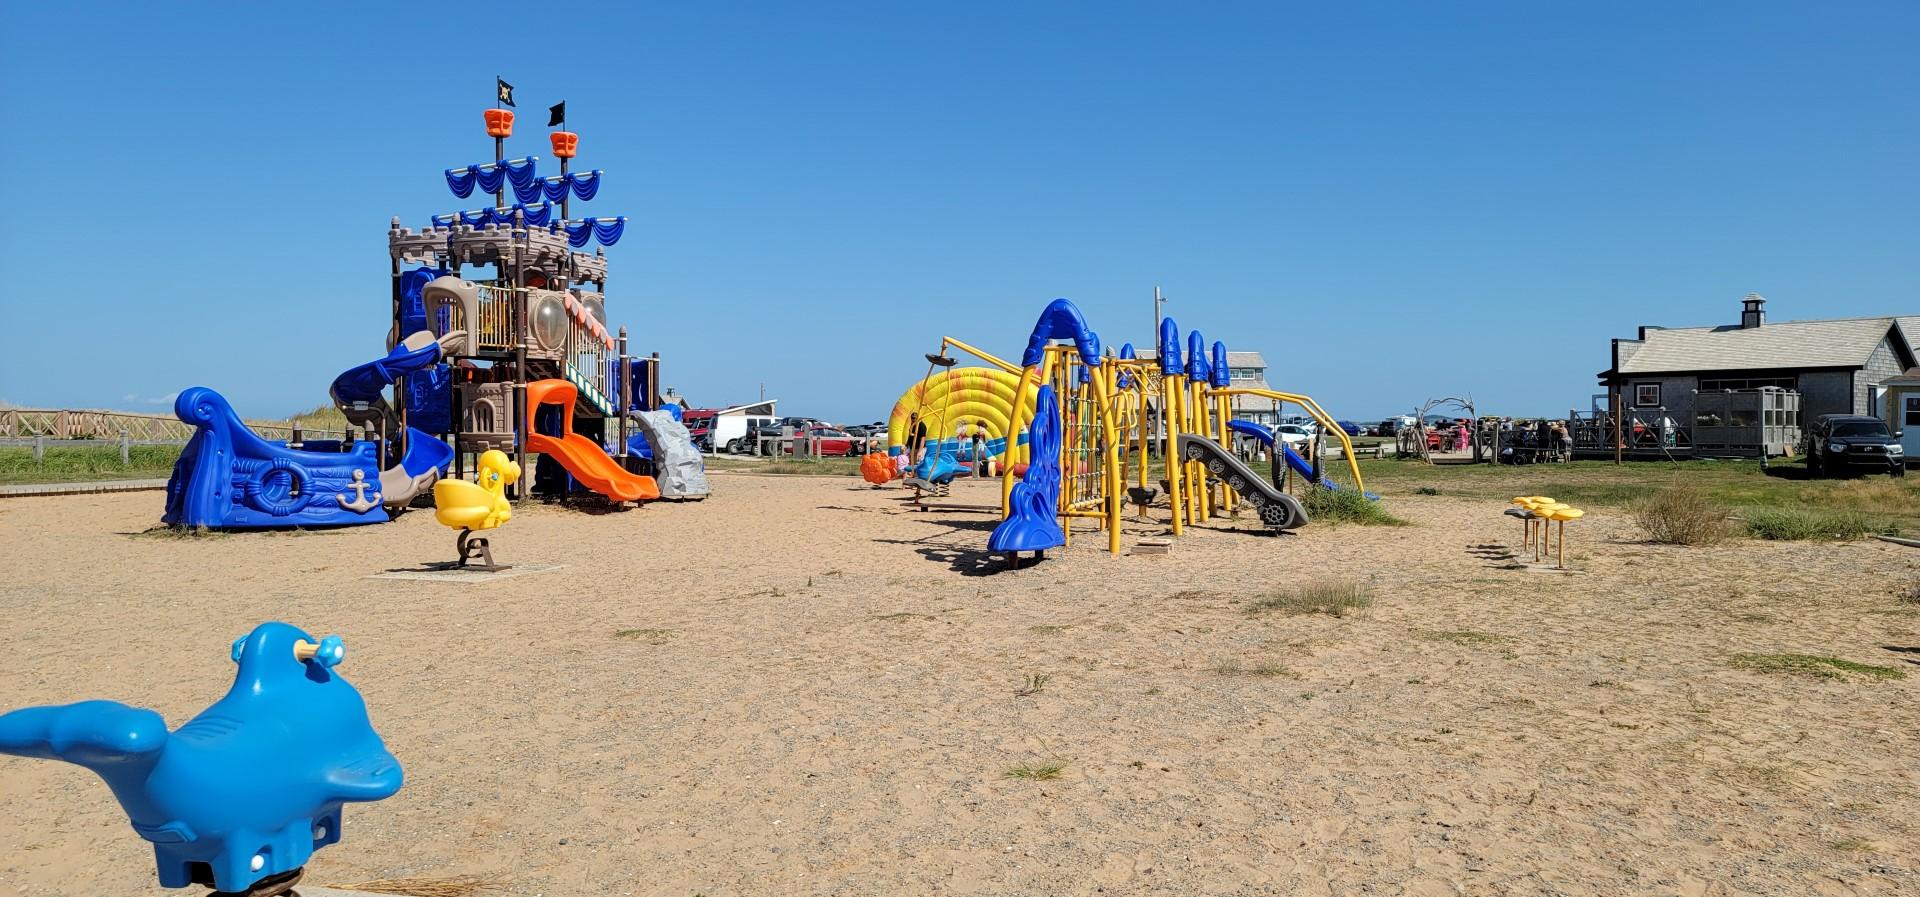 playground on L'anse-aux-Baleiniers